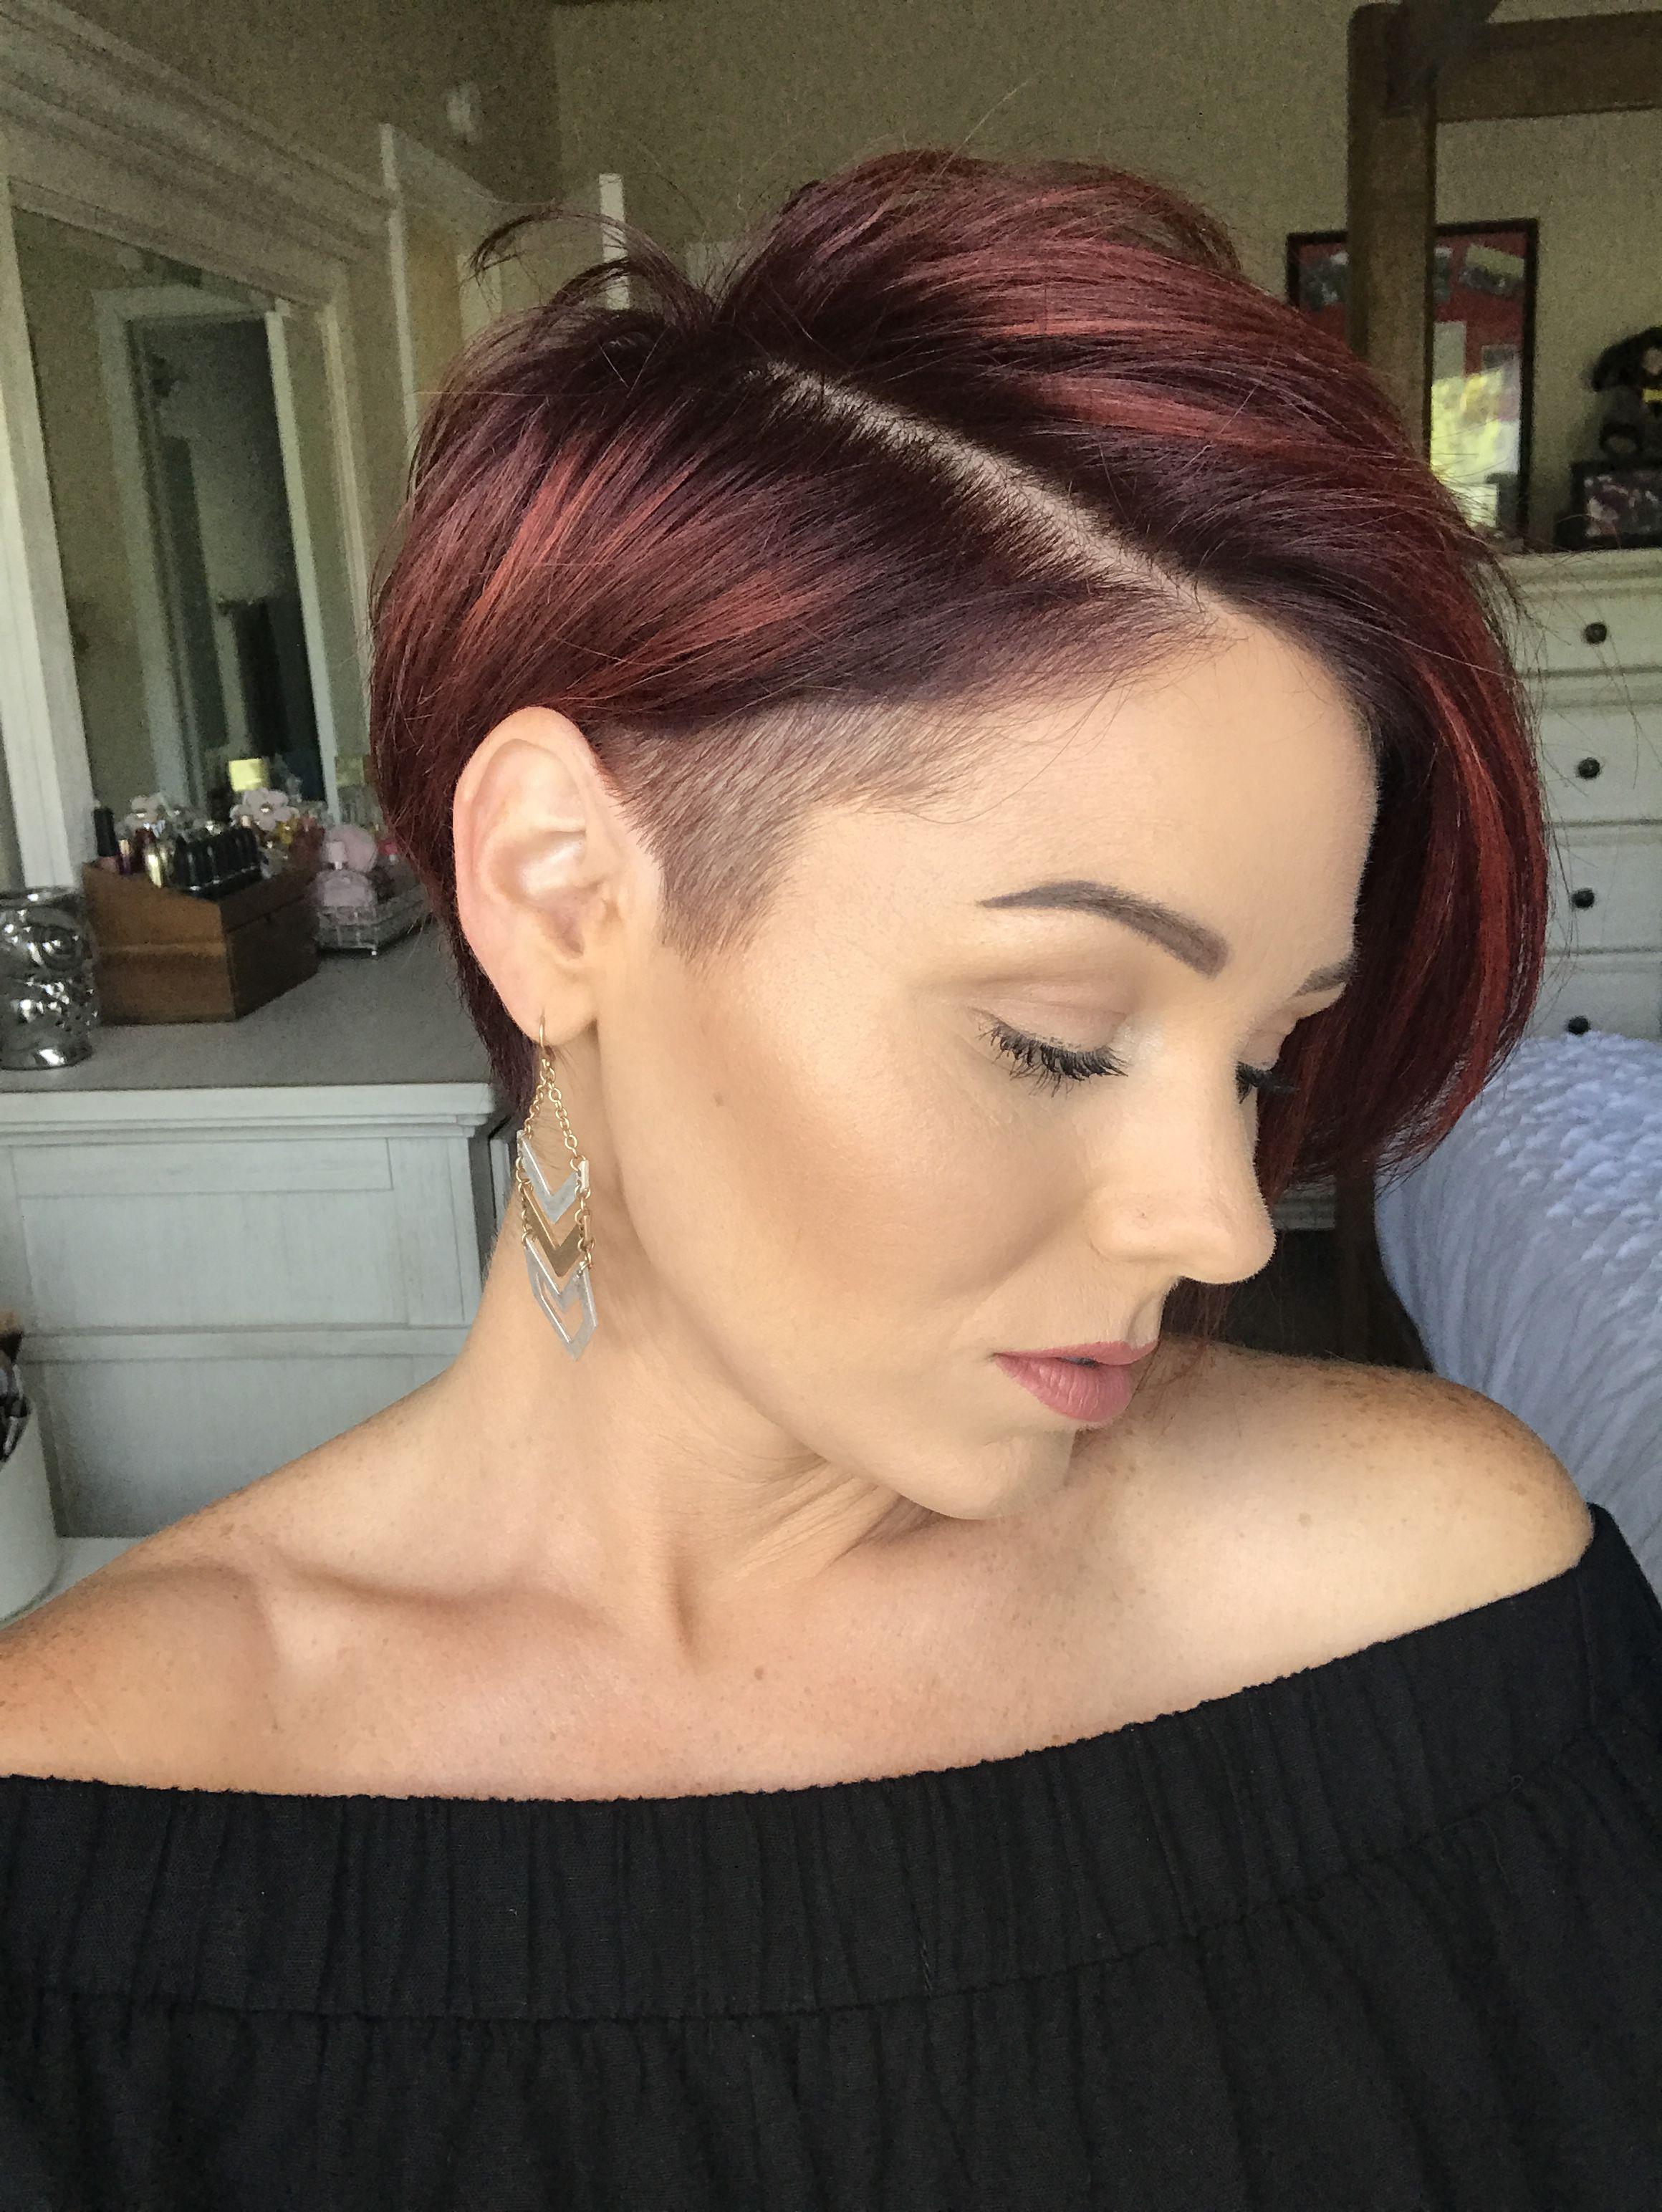 Undercut pixie asymmetrical shorthair redhair i like it